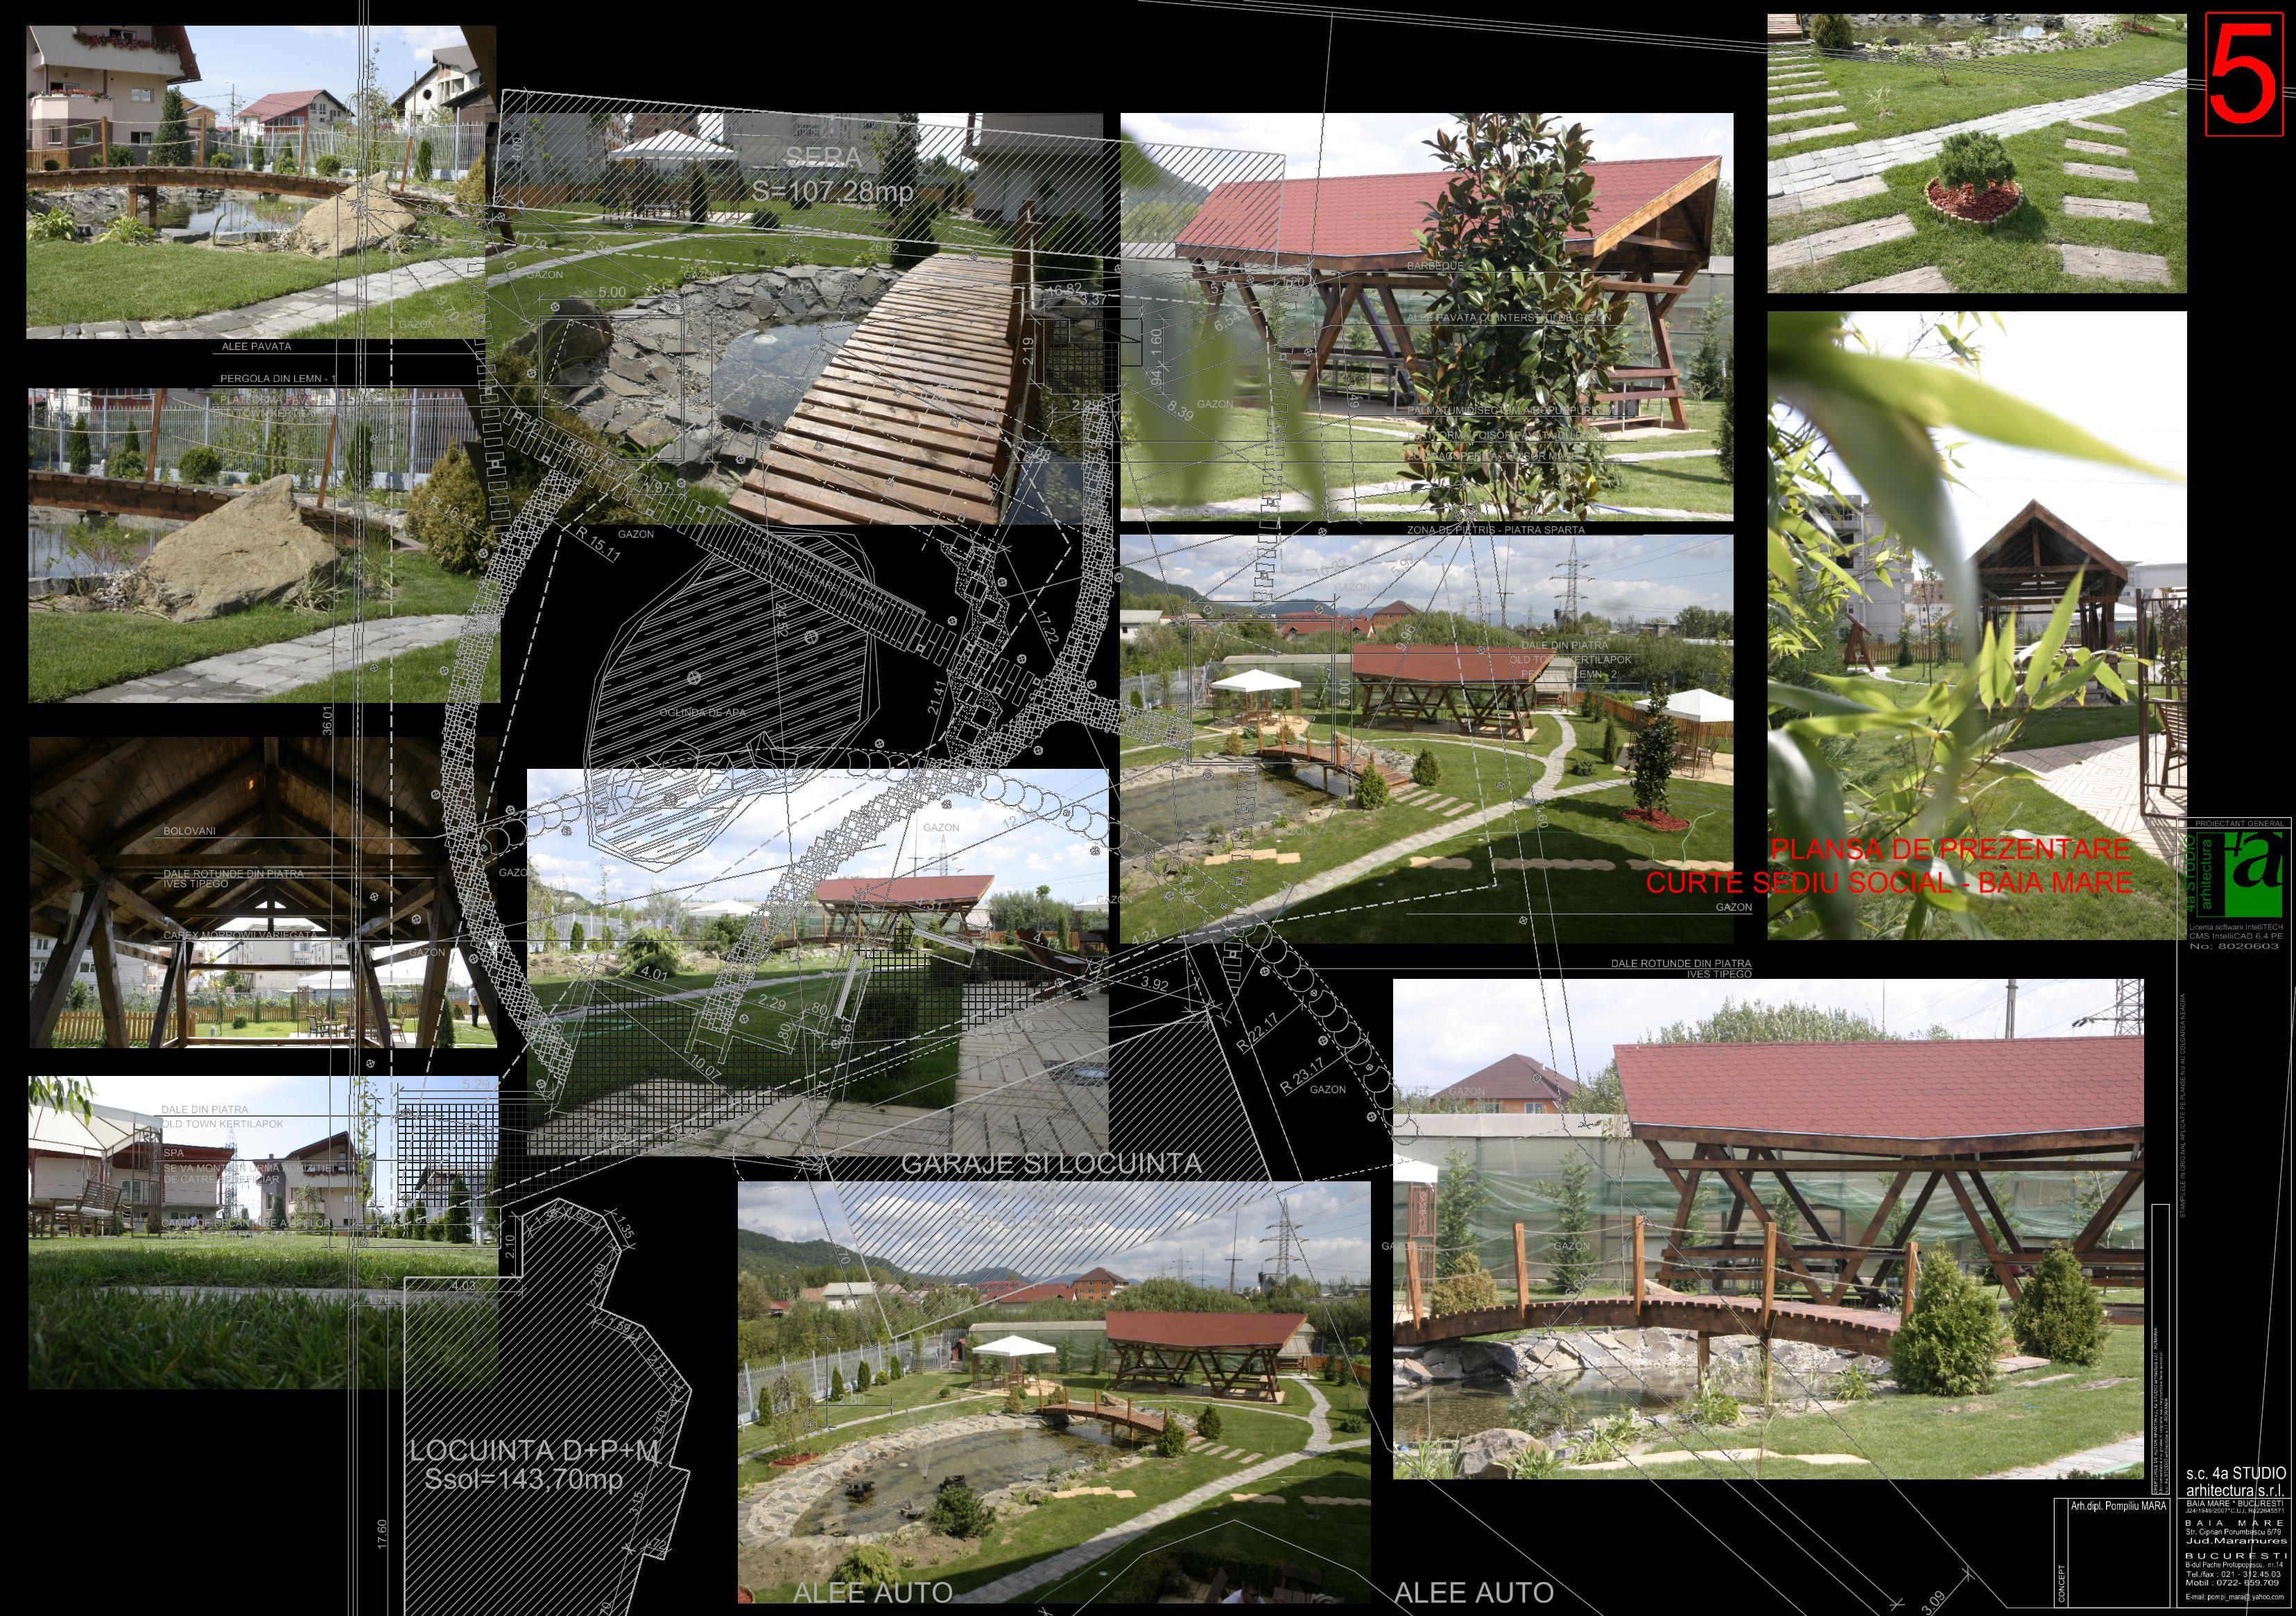 Amenajare gradina C - Baia Mare  - Poza 26